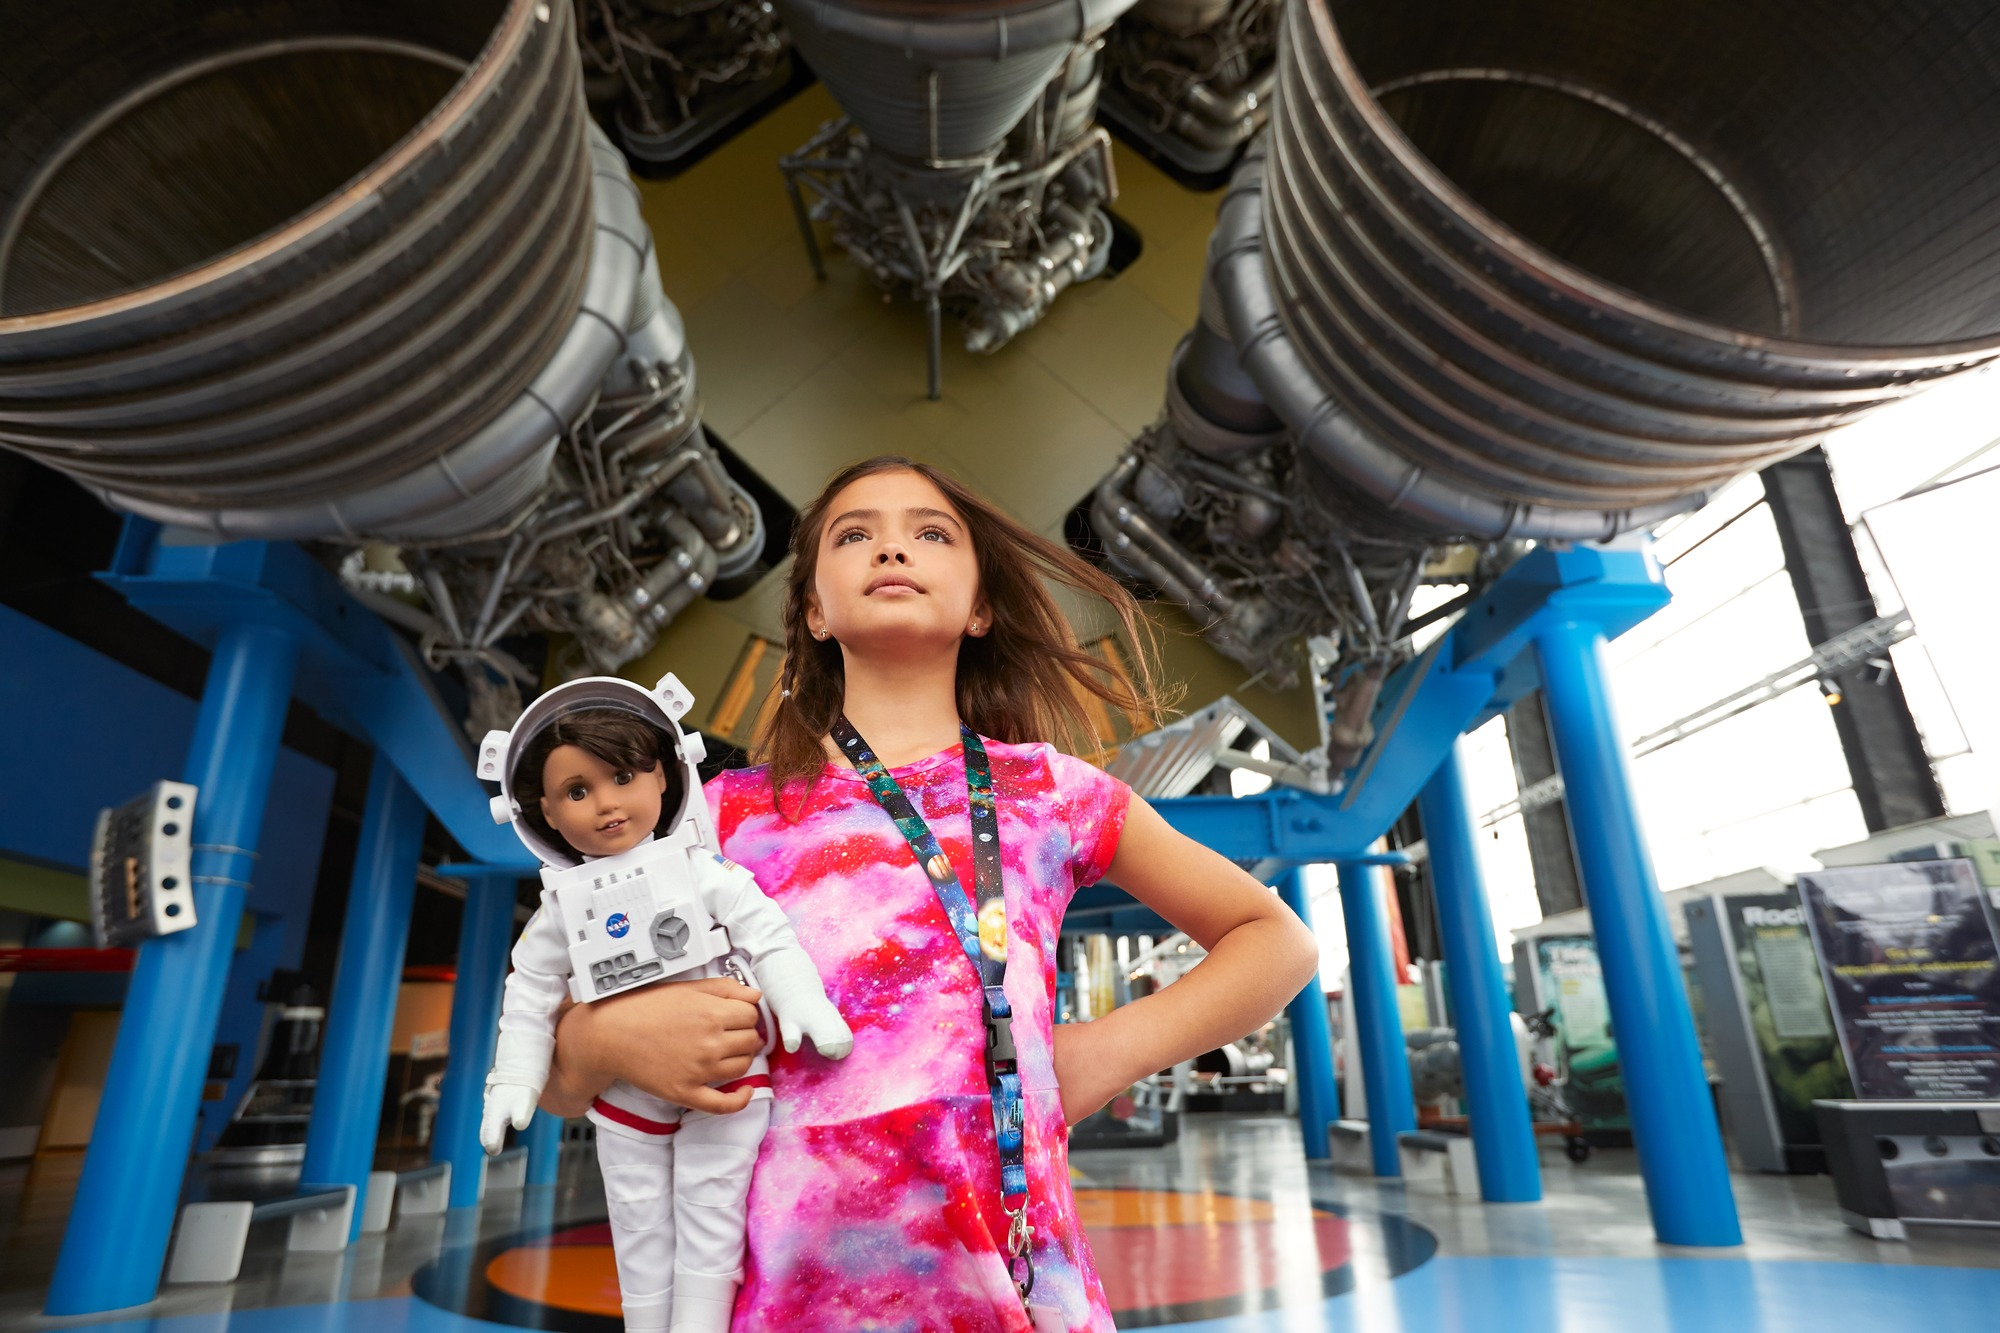 American Girl's 2018 Girl of the Year Is Luciana Vega - Aspiring Astronaut